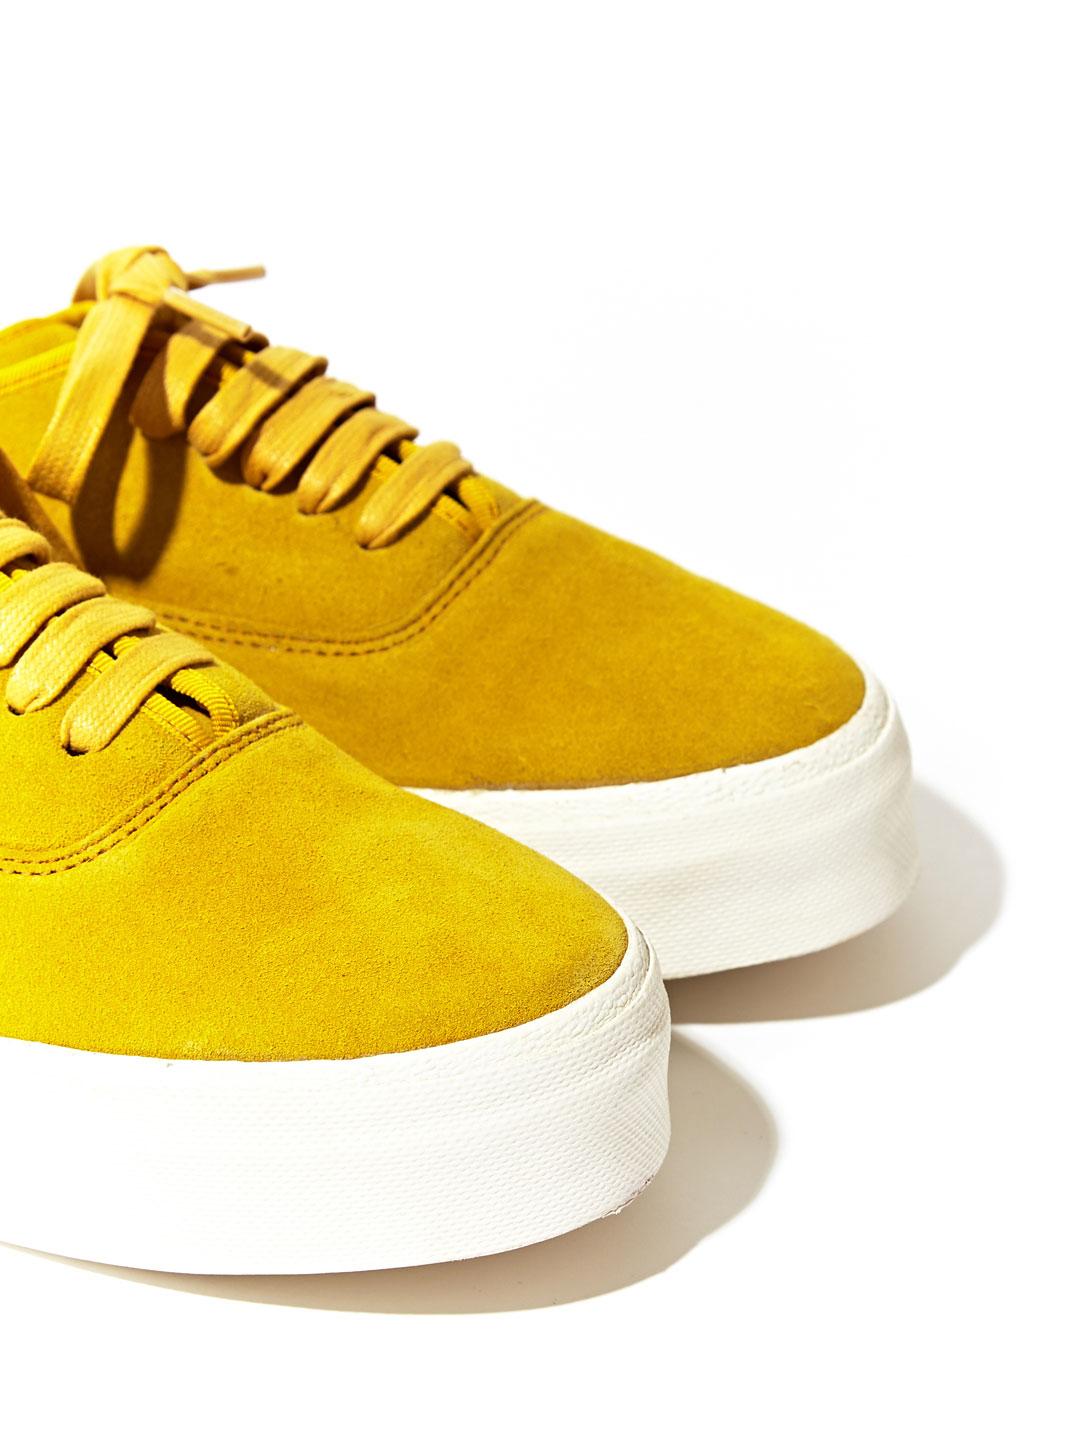 Eytys Unisex Suede Mother Sneakers In Yellow For Men Lyst